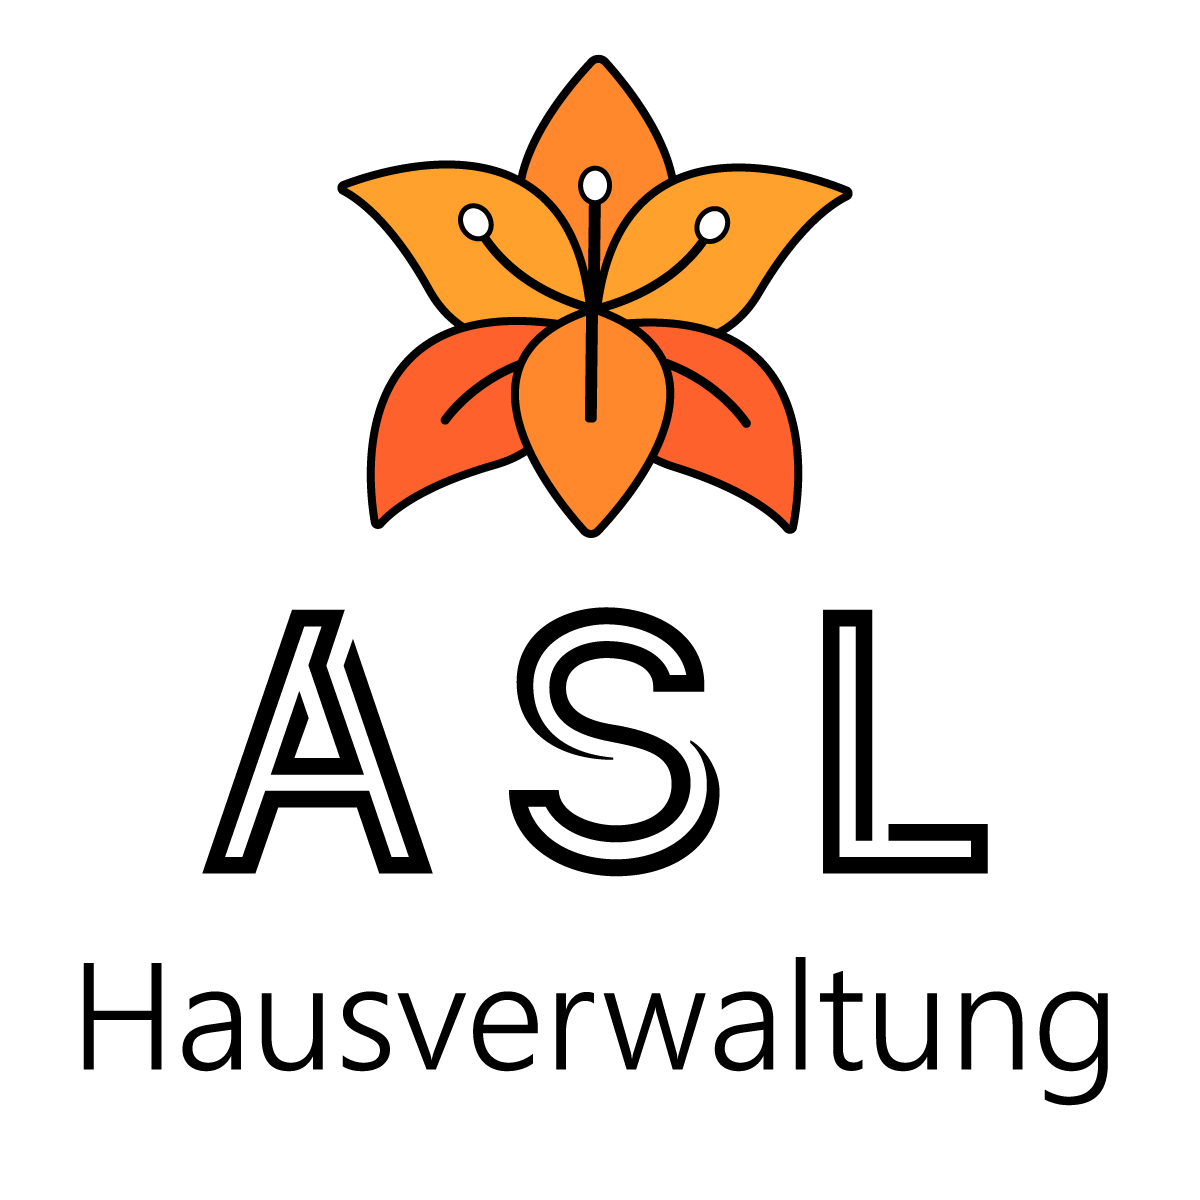 Logo der ASL Hausverwaltung aus Bondorf